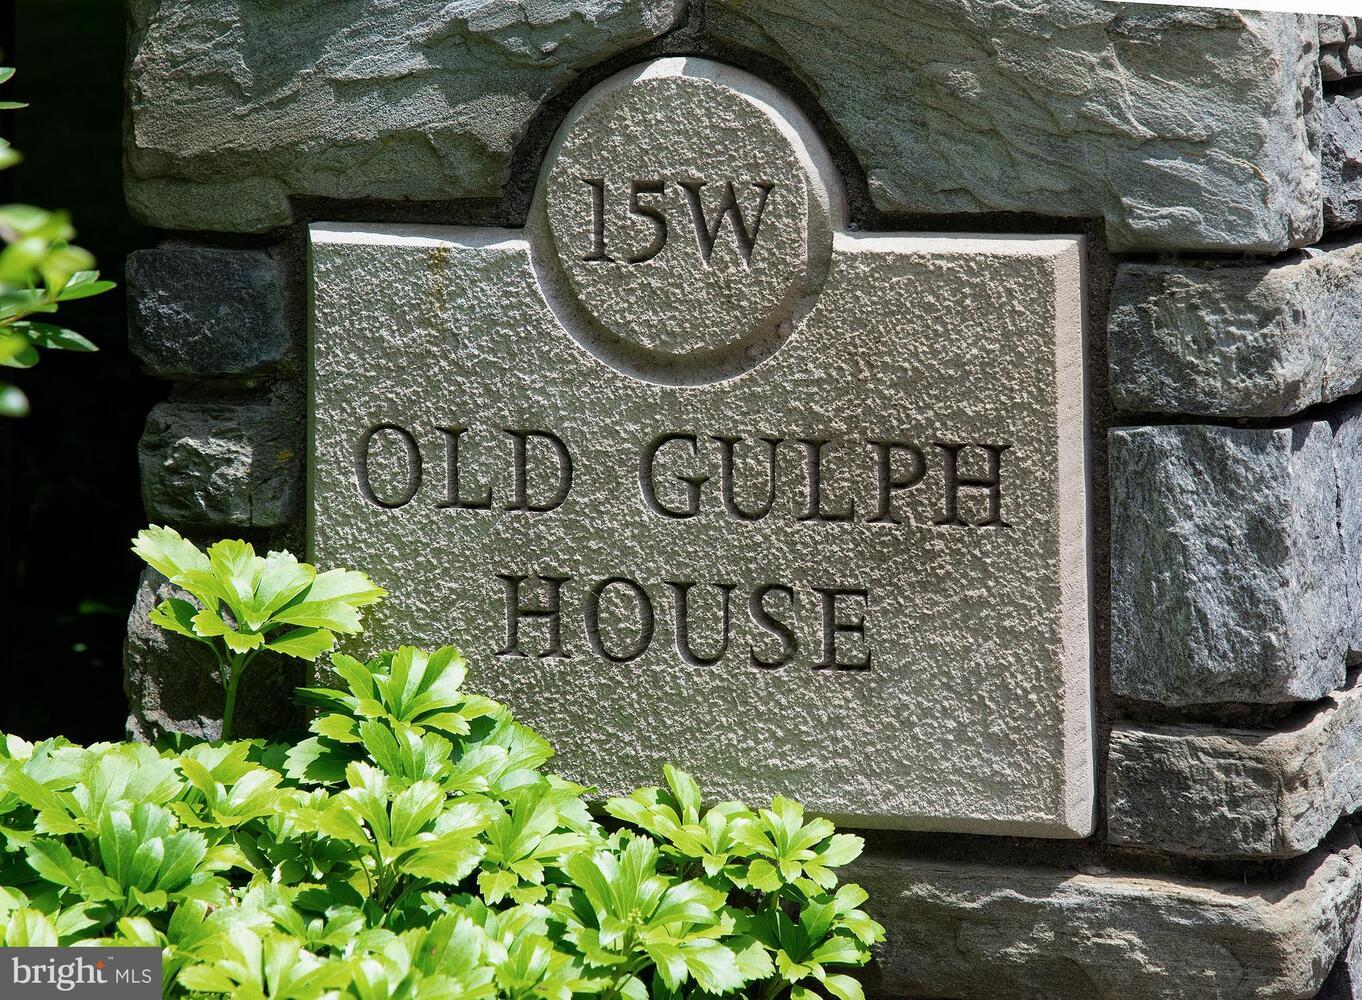 15 W Old Gulph Rd photo